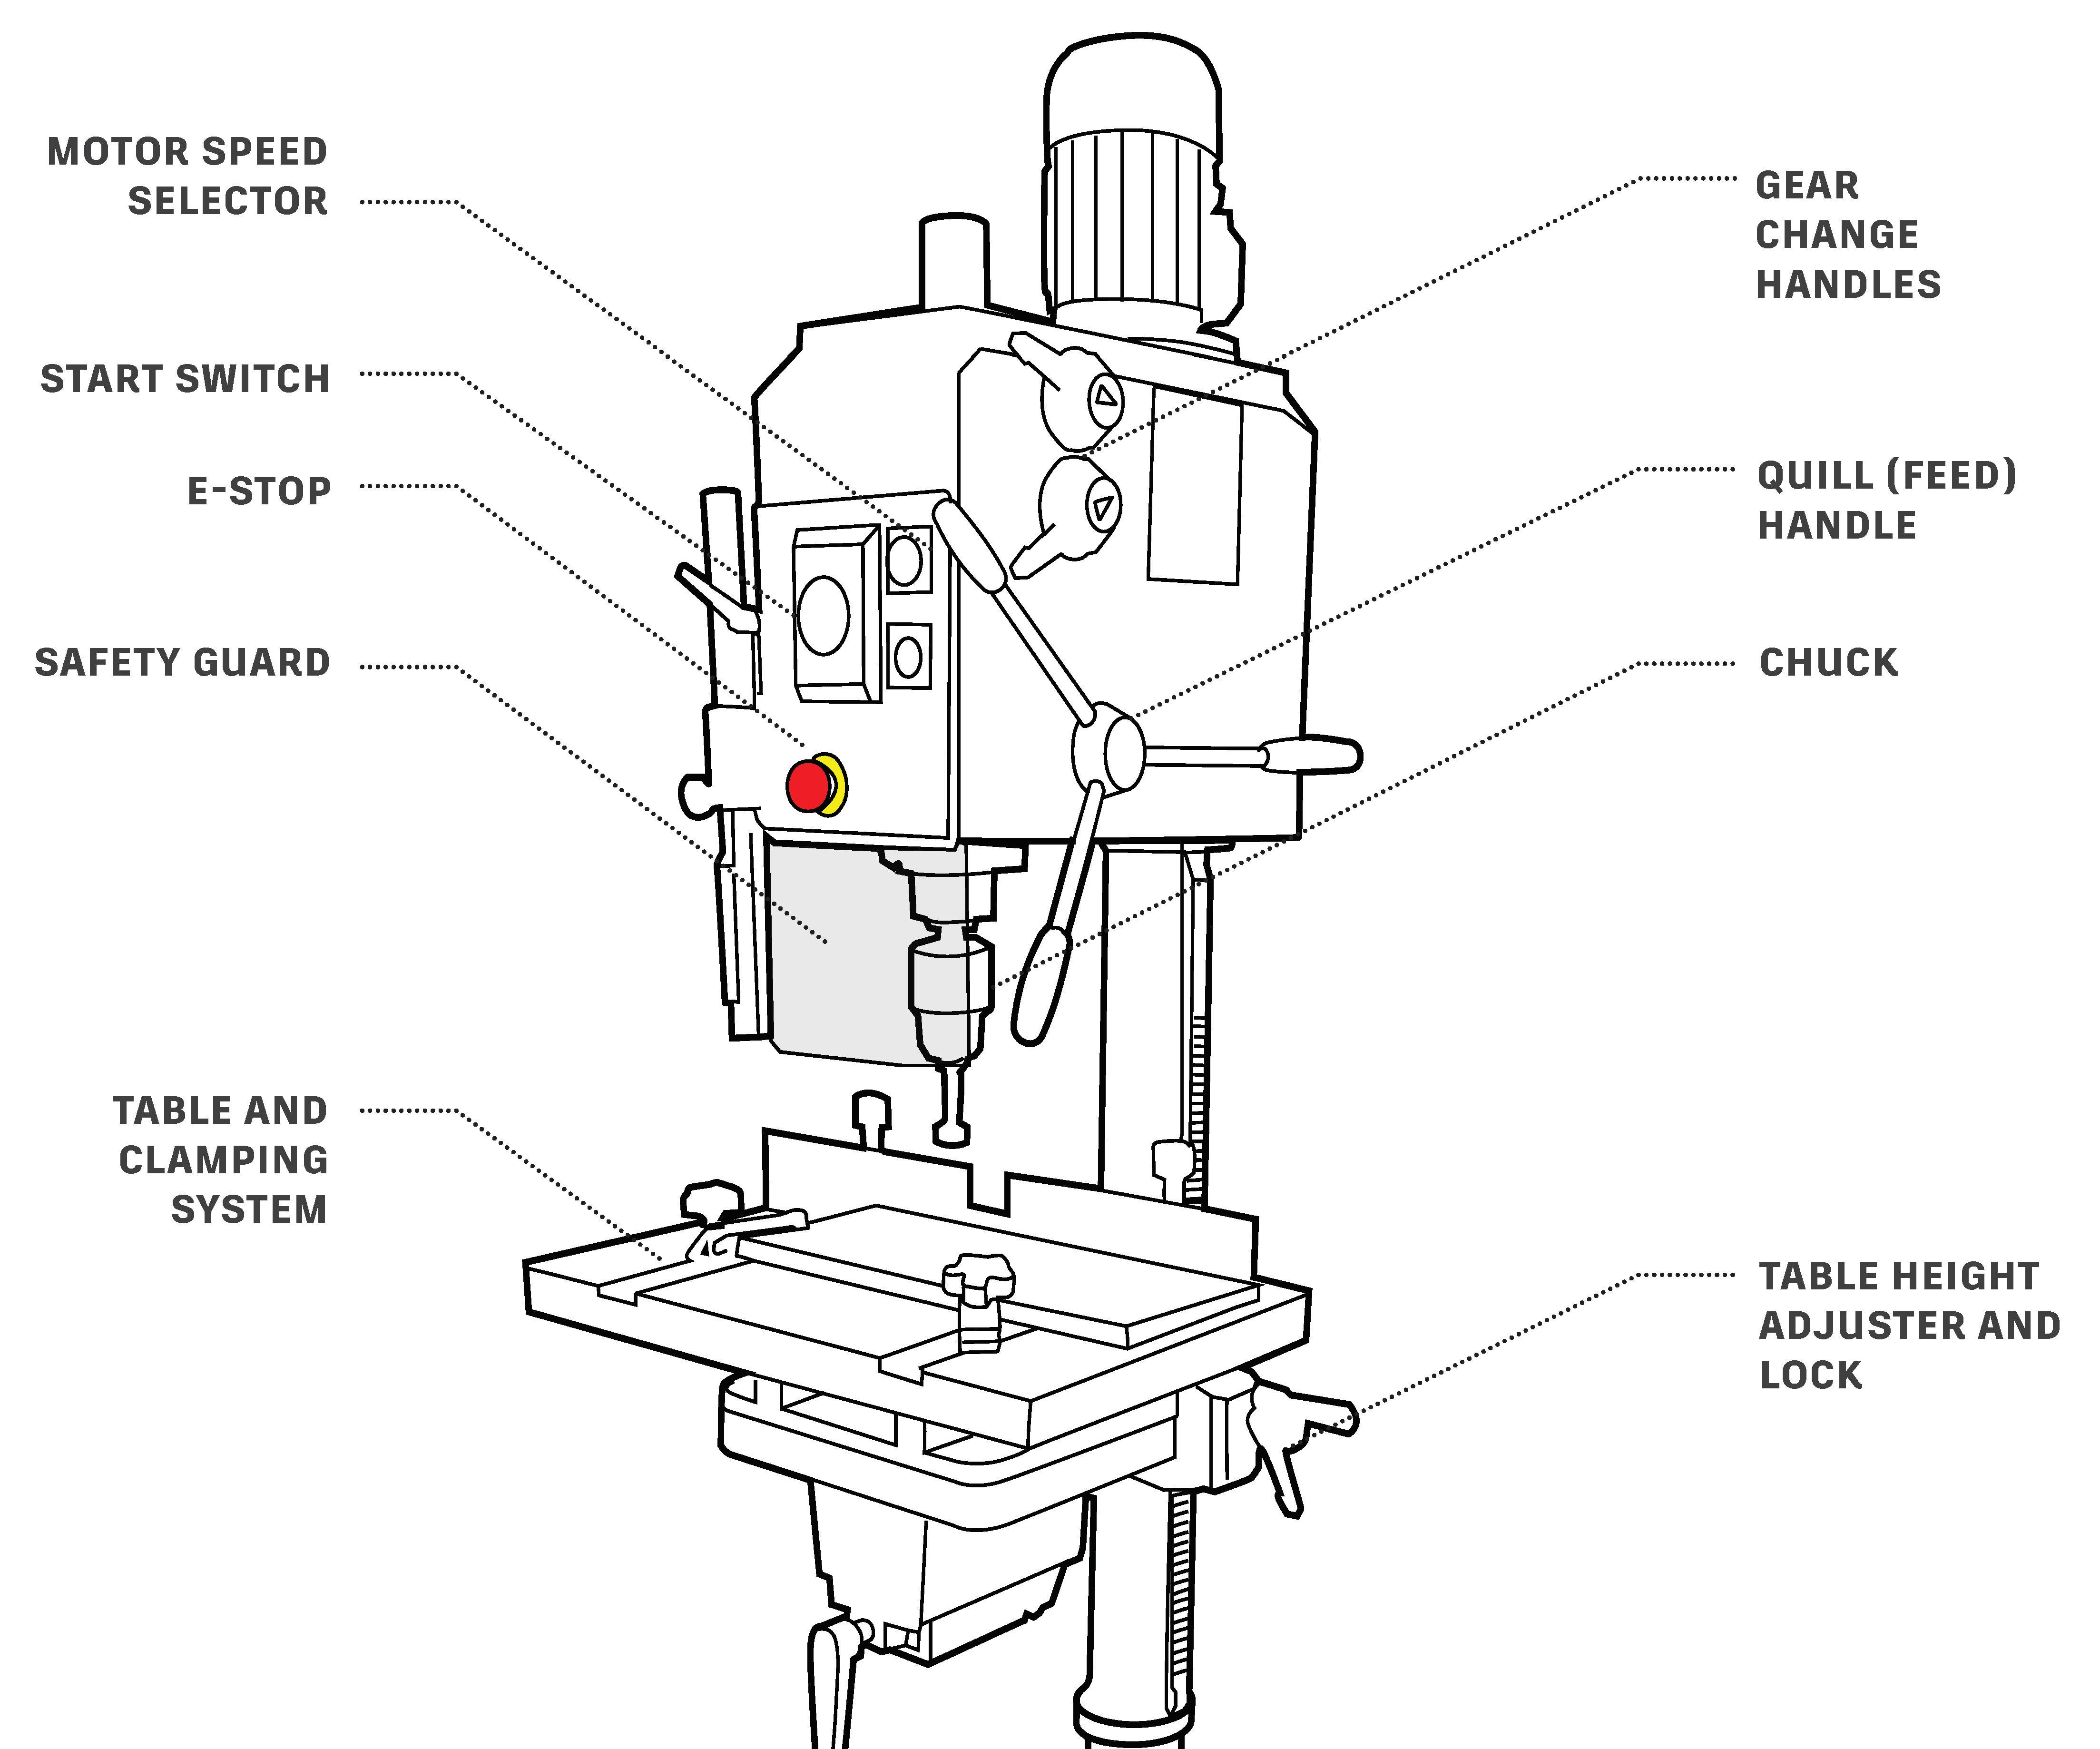 hight resolution of drill press wiring diagram wiring diagram yer drill press wiring diagram